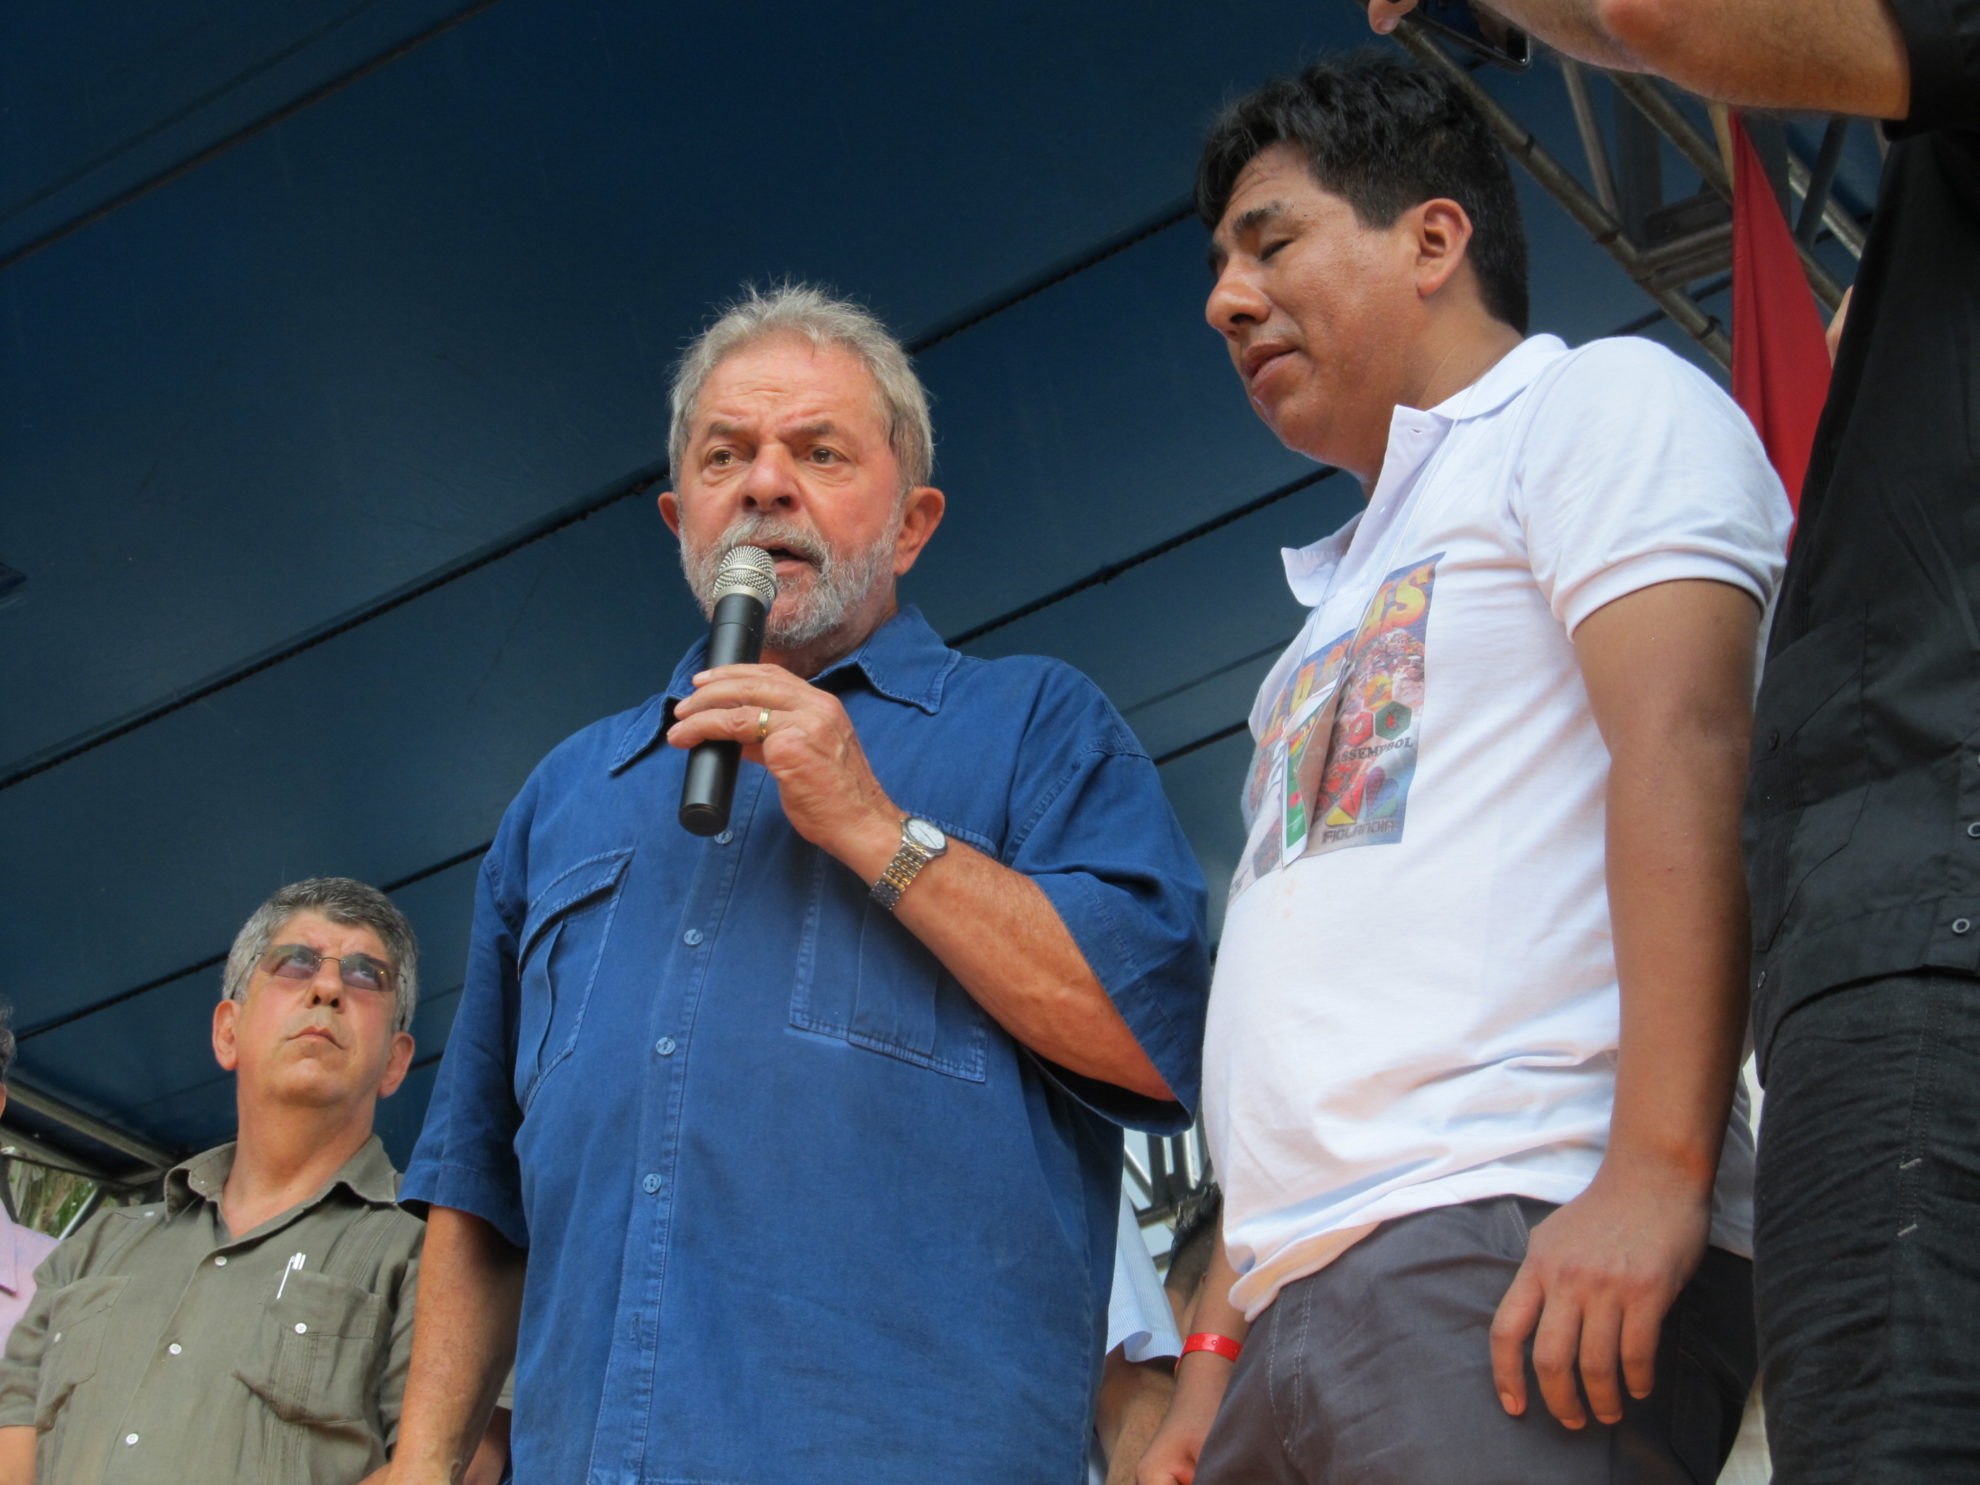 Ex-presidente Lula discursa na Alasitas e manifesta apoio aos imigrantes. Crédito: Rodrigo Borges Delfim